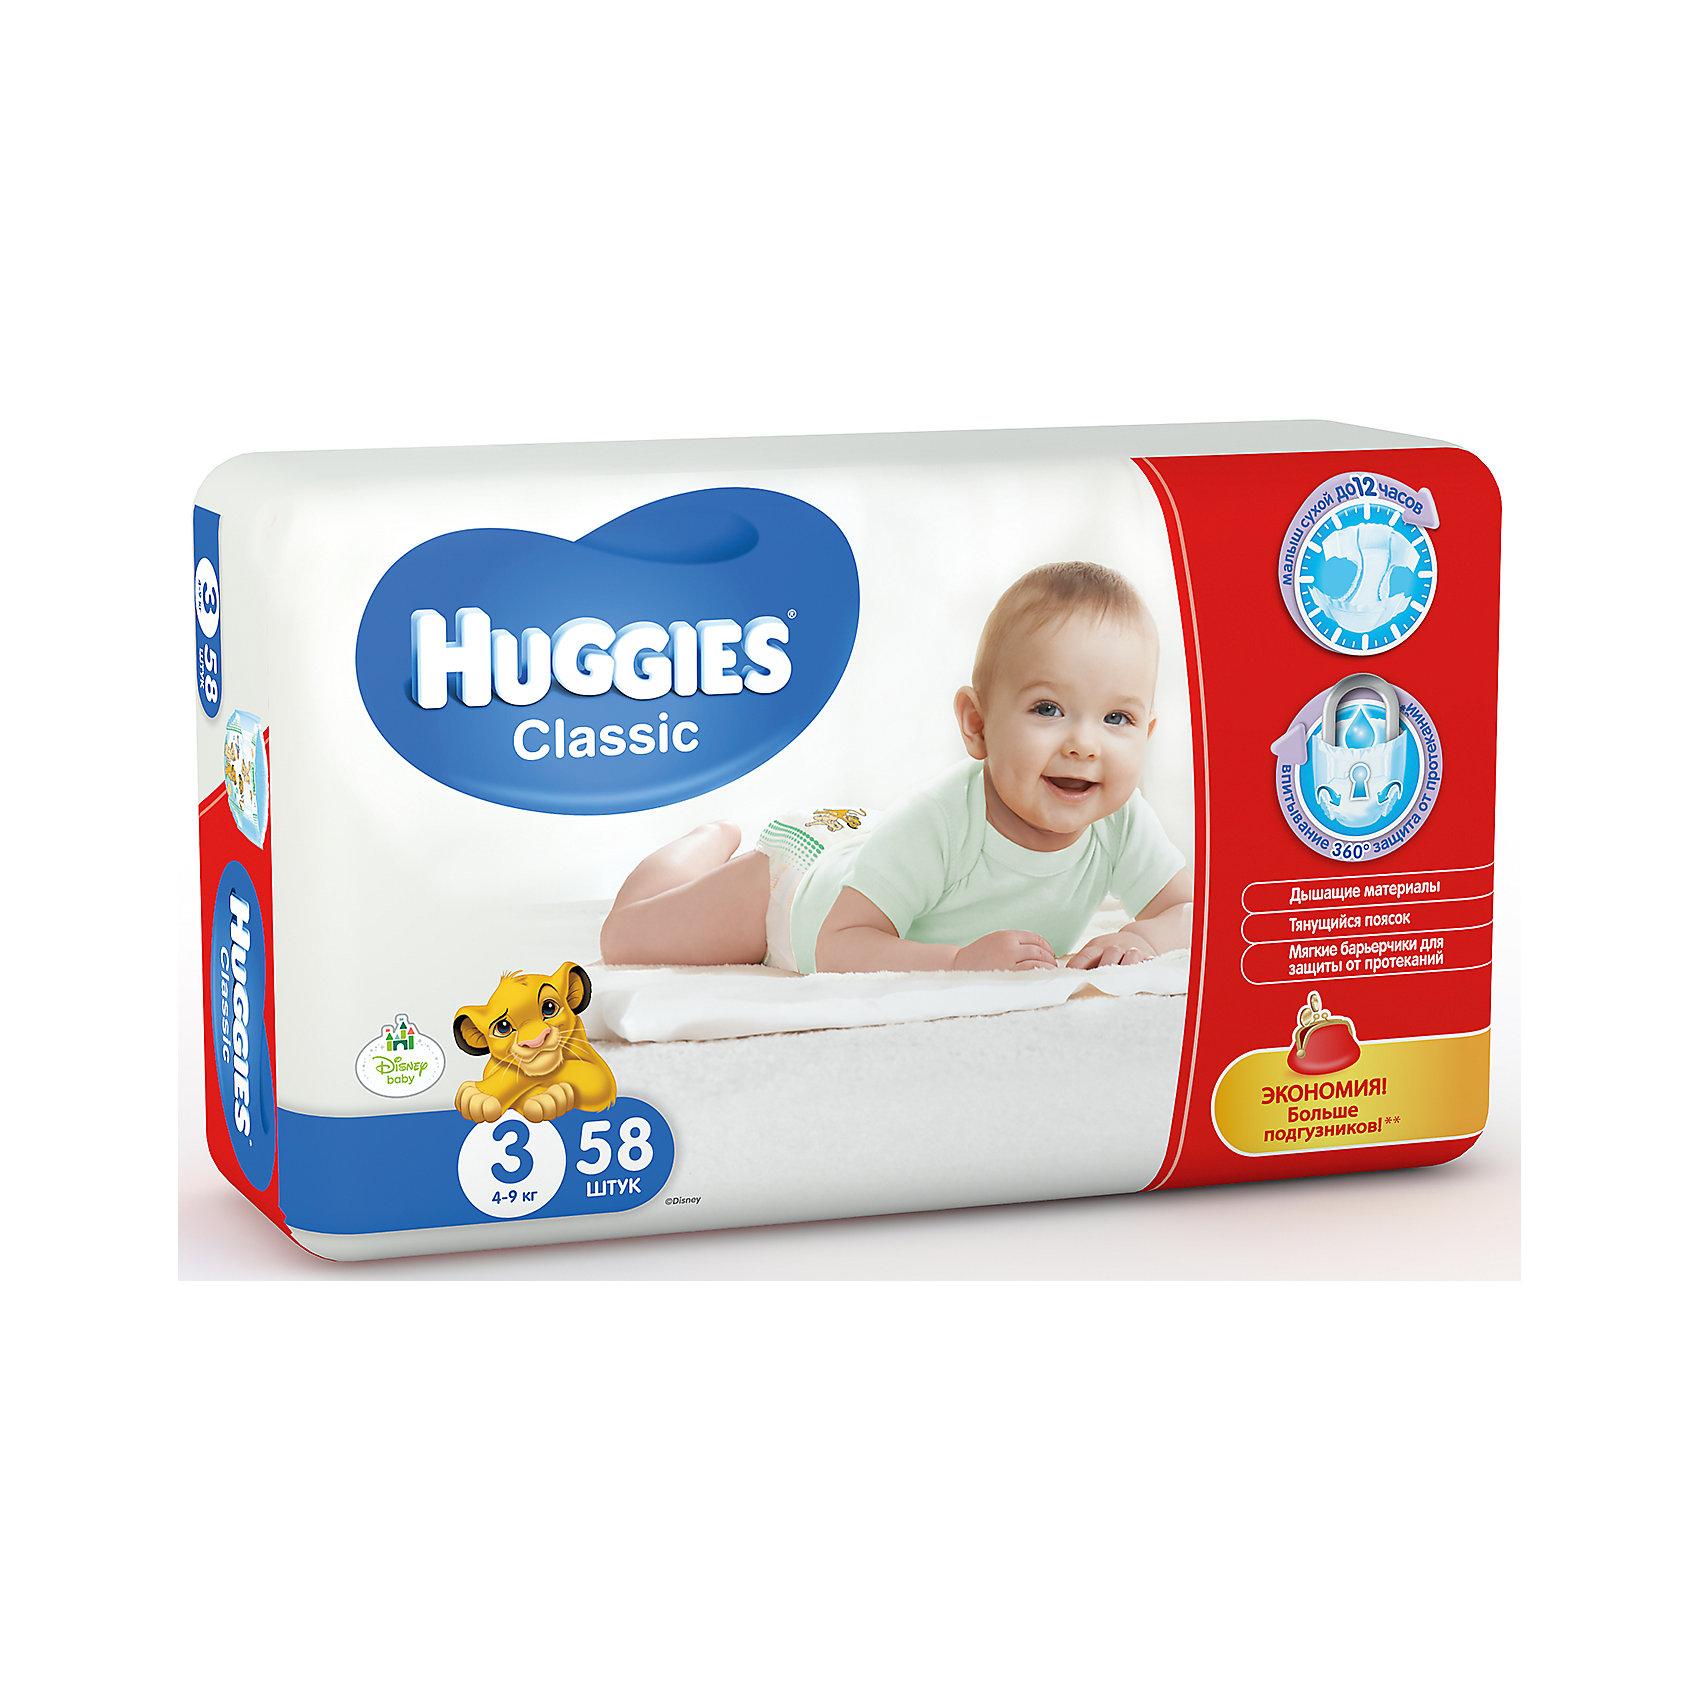 HUGGIES Подгузники Huggies Classic (3) Jumbo Pack 4-9 кг, 58 шт.